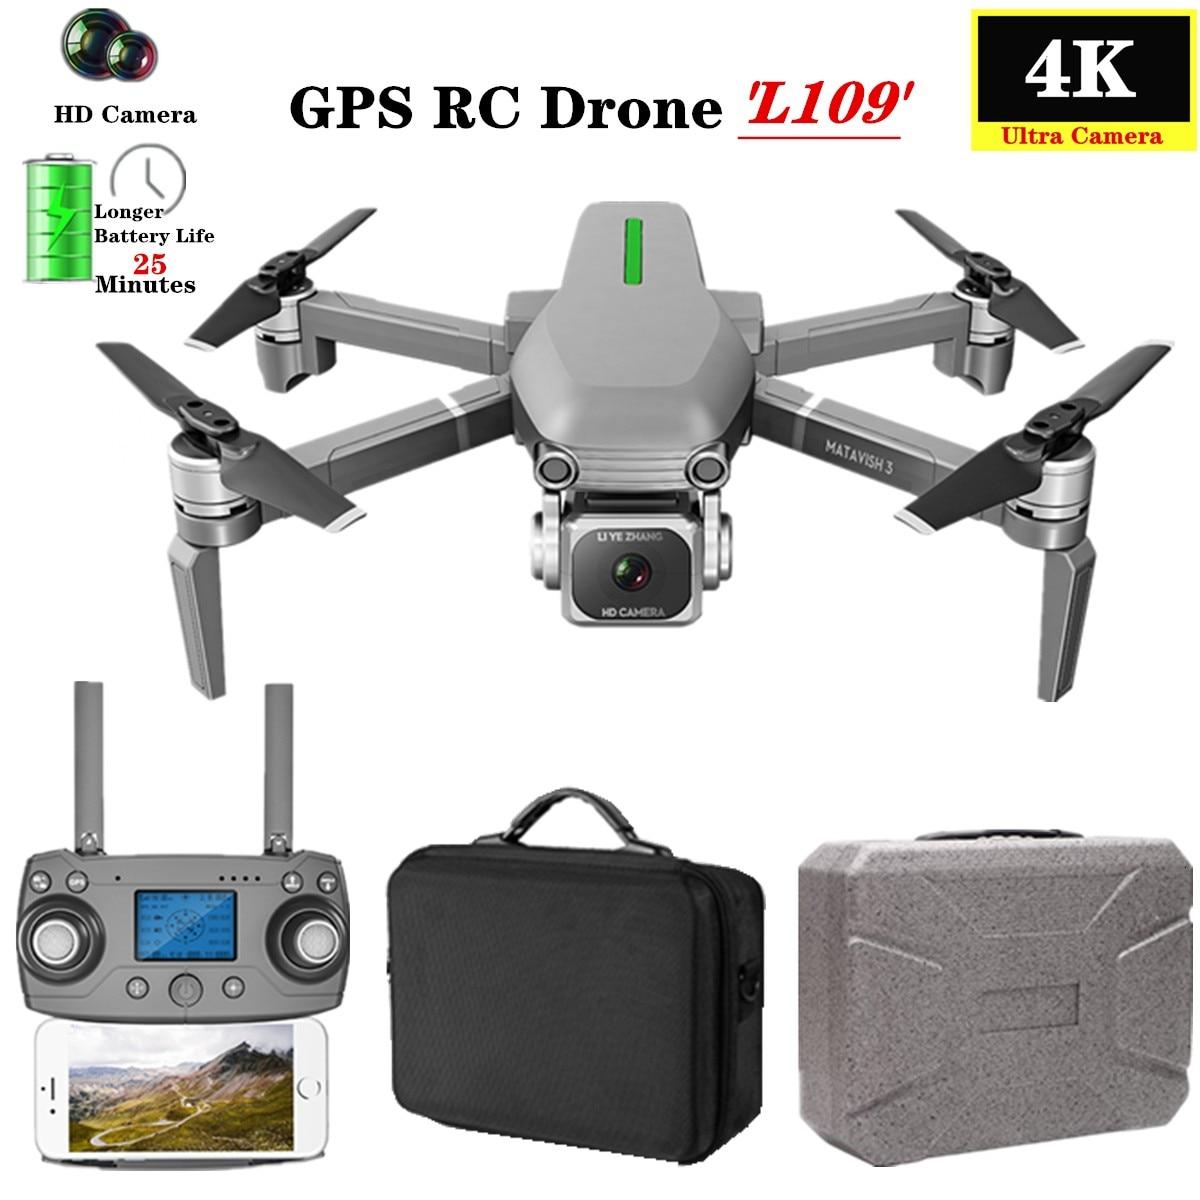 L109-S RC Drone Quadcopter 4K HD Cámara 5G WiFi GPS Drones con una tecla de retorno altura mantener 800m WiFi imagen distancia dron Juguetes